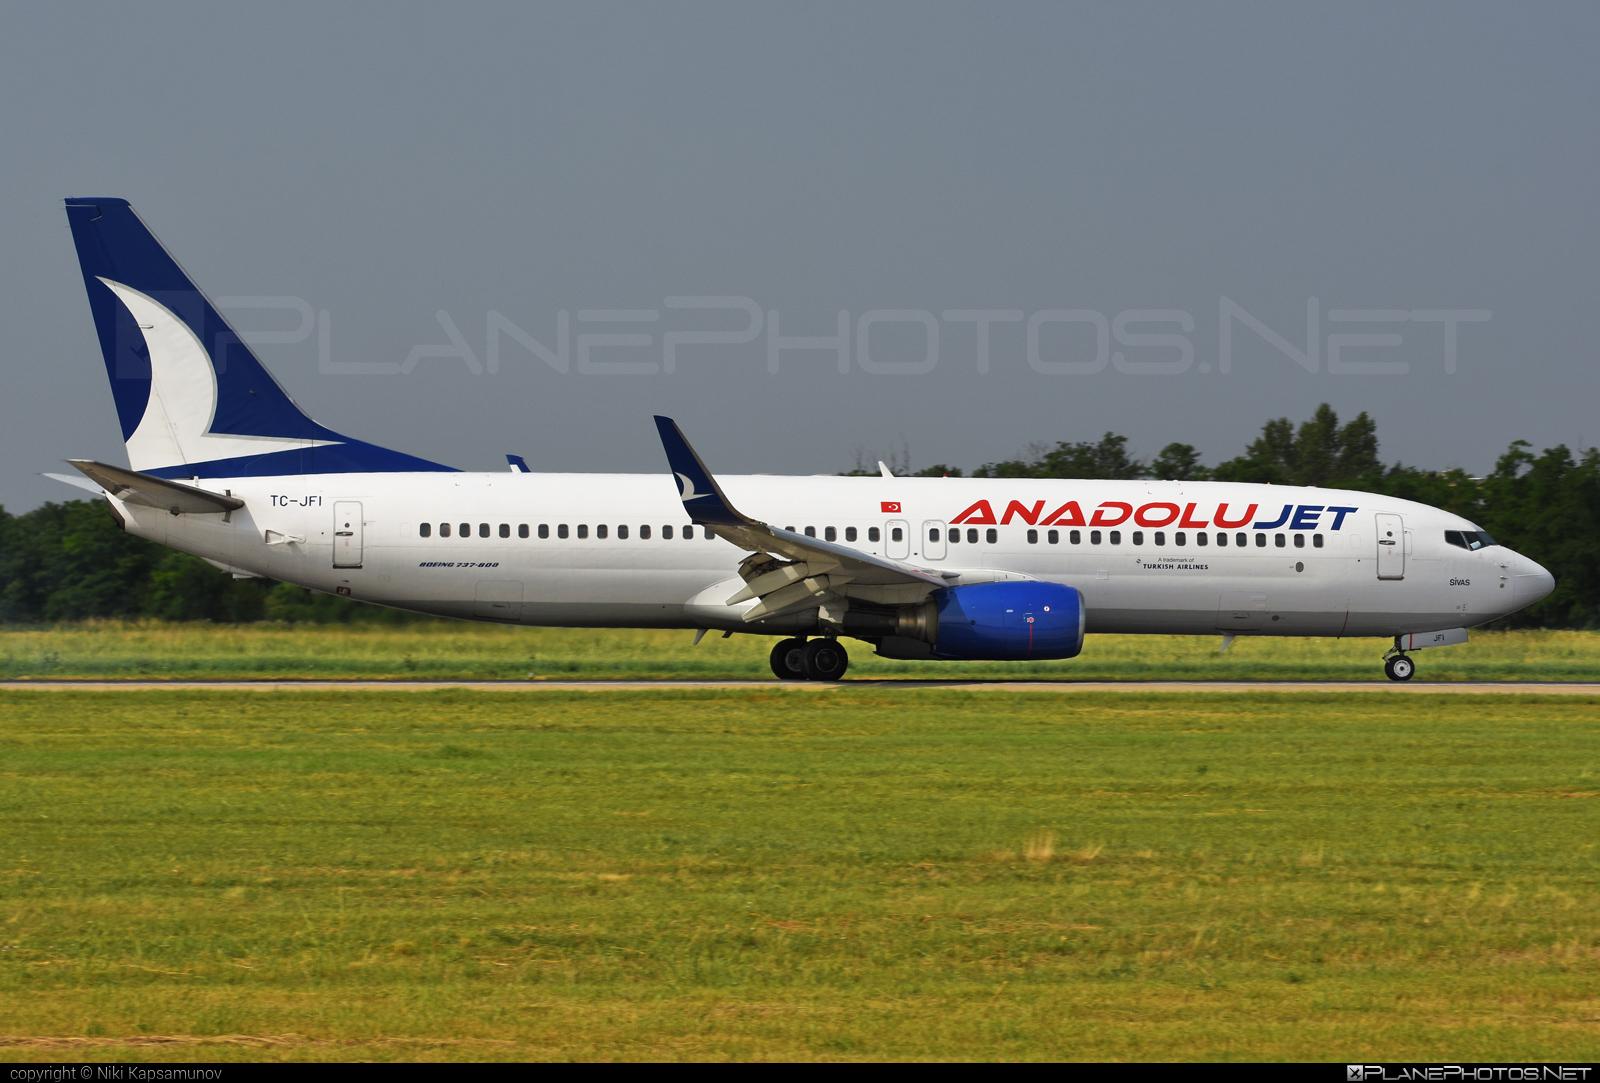 Boeing 737-800 - TC-JFI operated by AnadoluJet #b737 #b737nextgen #b737ng #boeing #boeing737